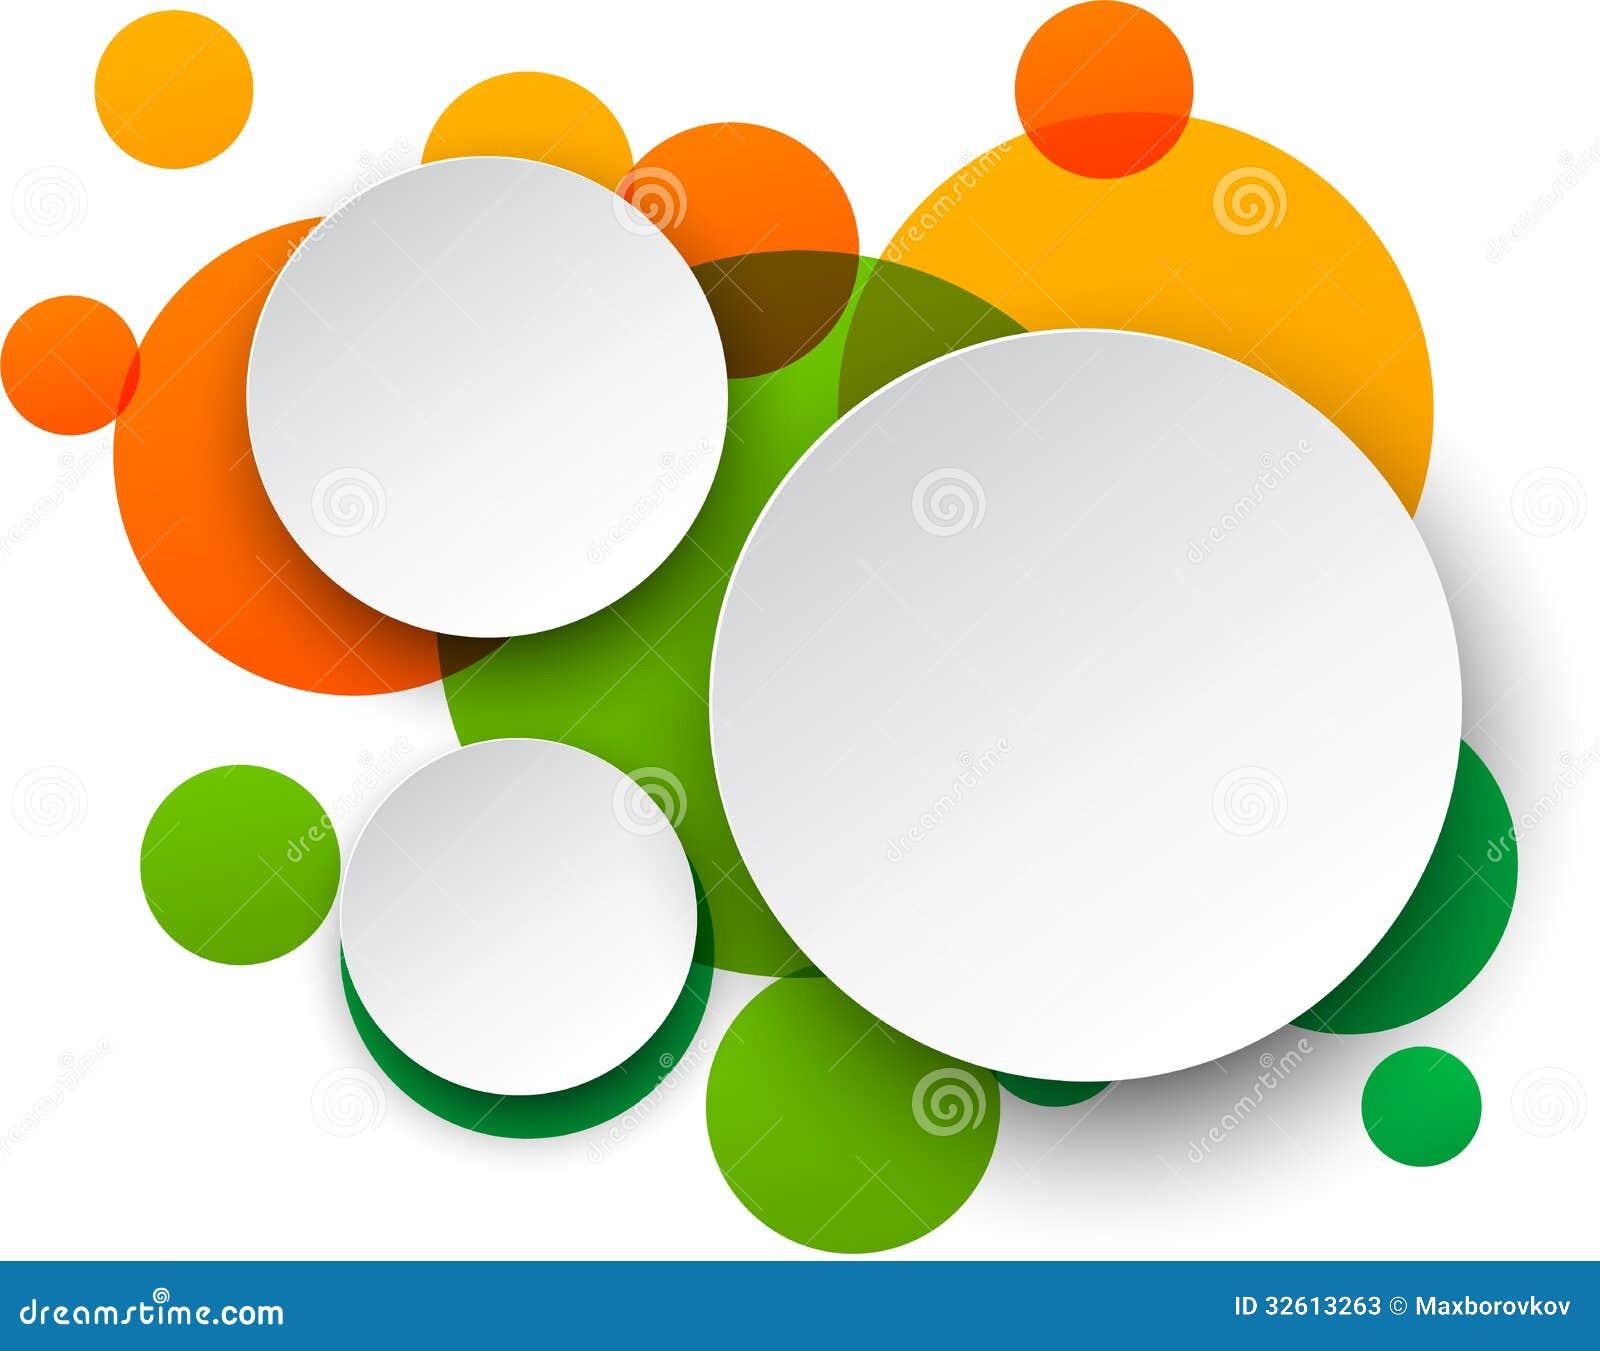 Paper White Round Speech Bubbles. Stock Vector - Image ...